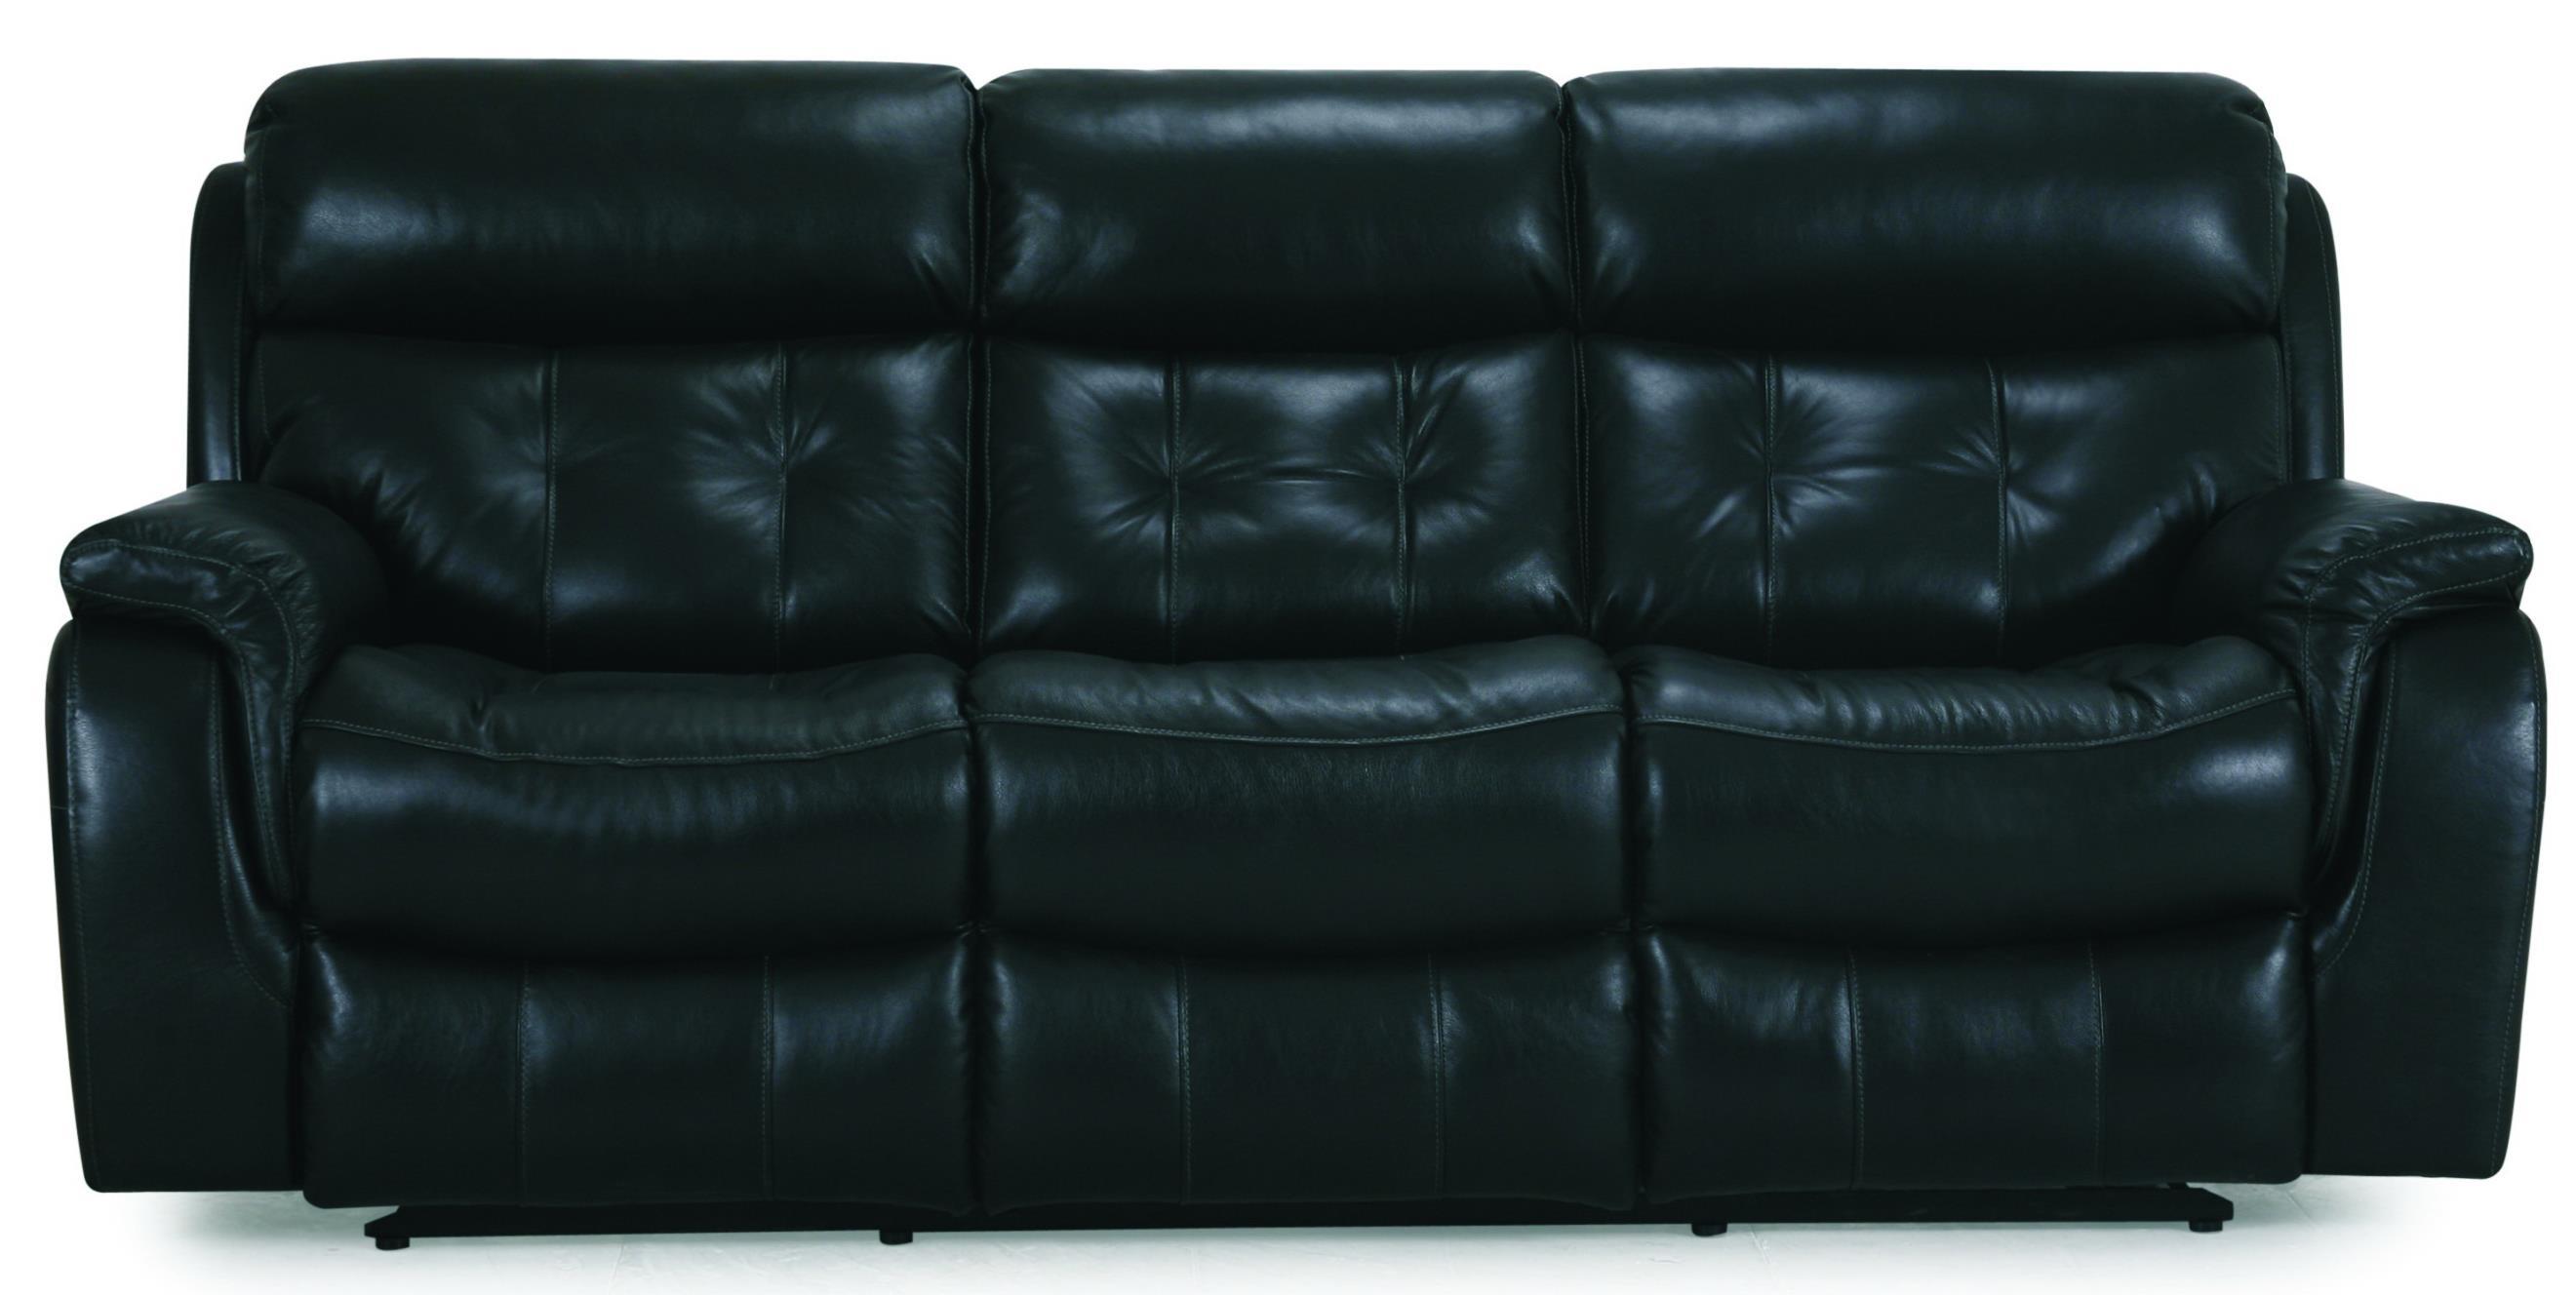 Cheers Sofa 9021  Power Reclining Sofa - Item Number: 9021M-L3-2E-2044